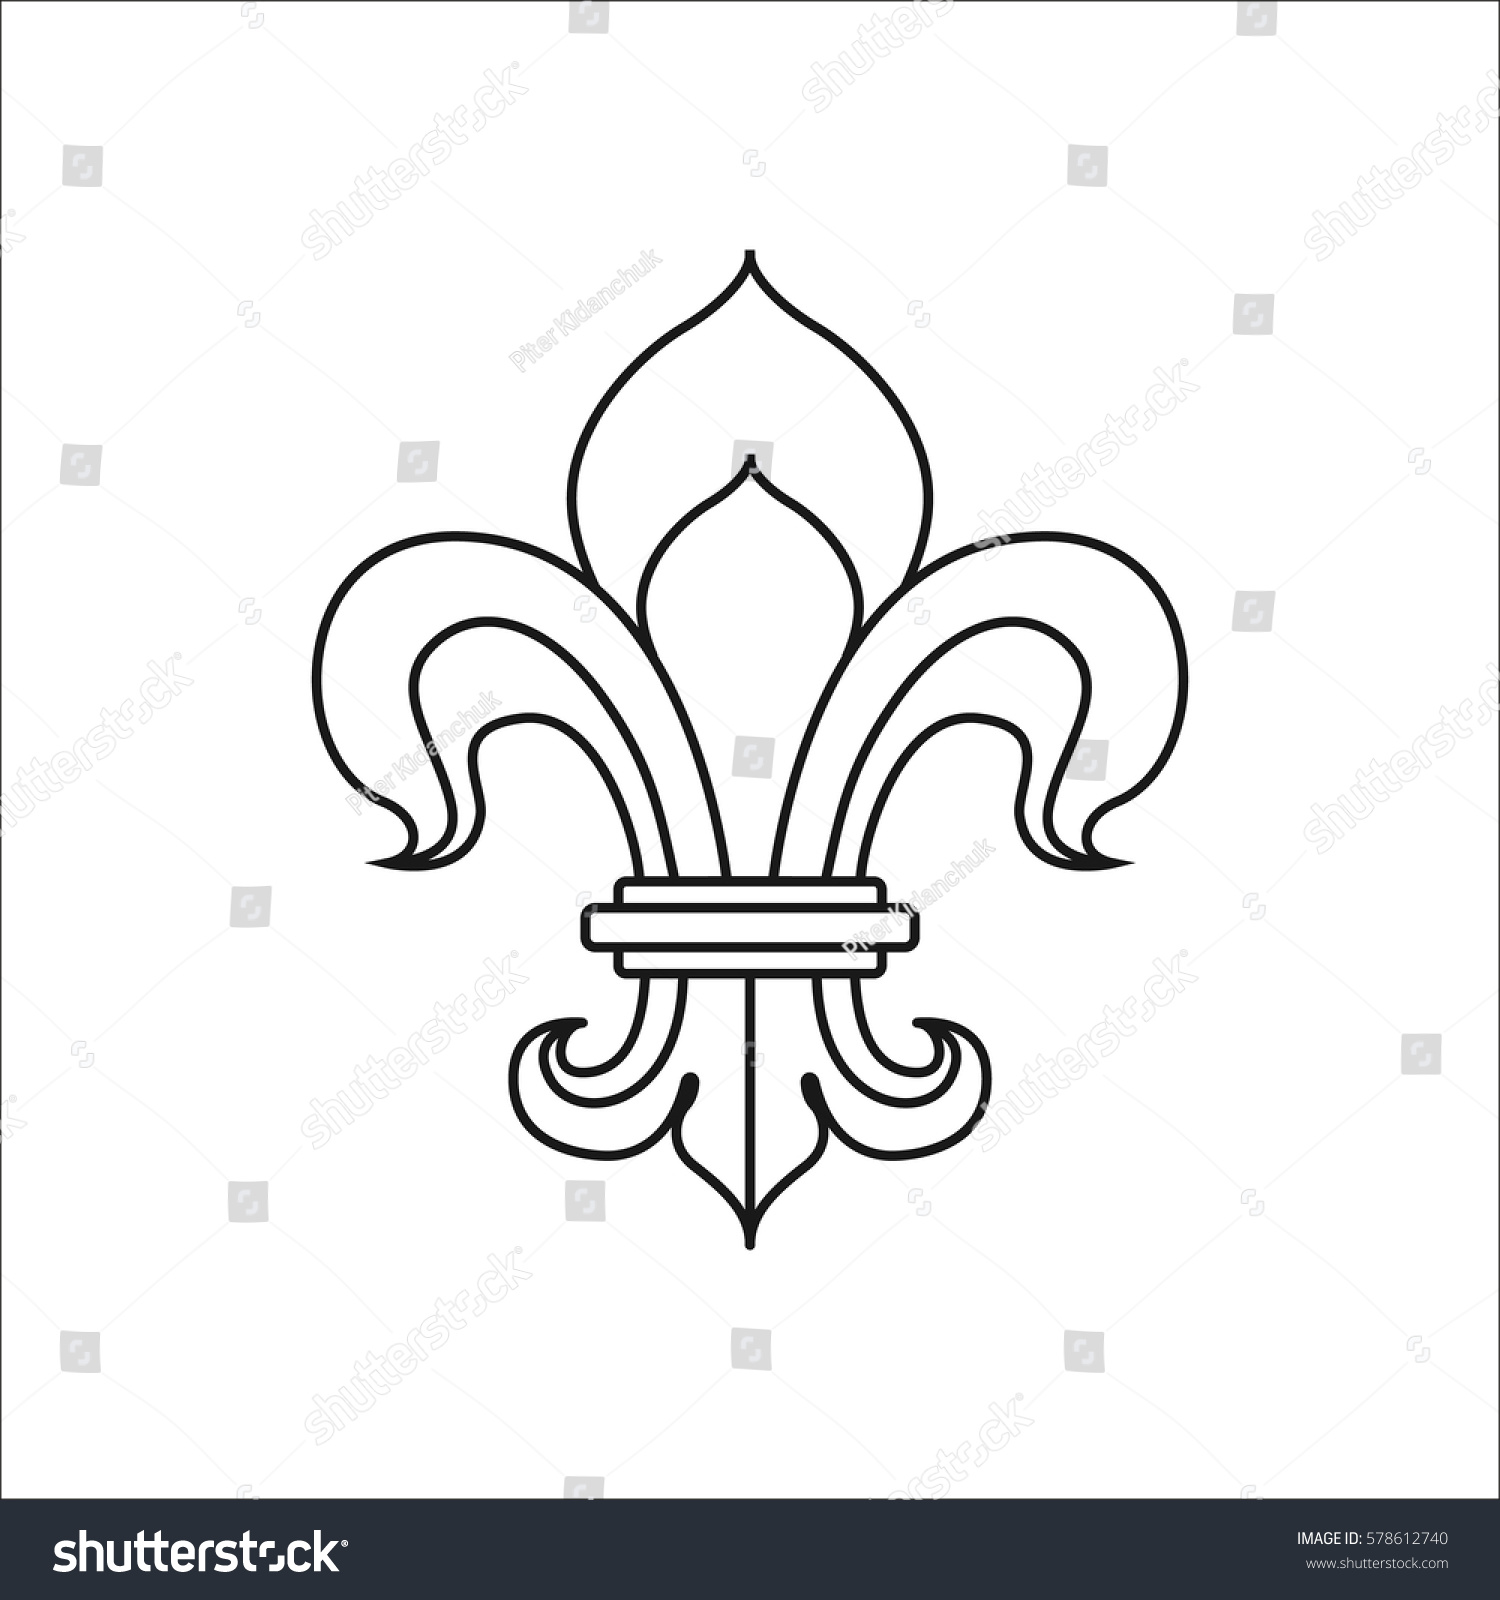 Royal lily fleur de lis symbol stock vector 578612740 shutterstock royal lily or fleur de lis symbol simple line icon on background biocorpaavc